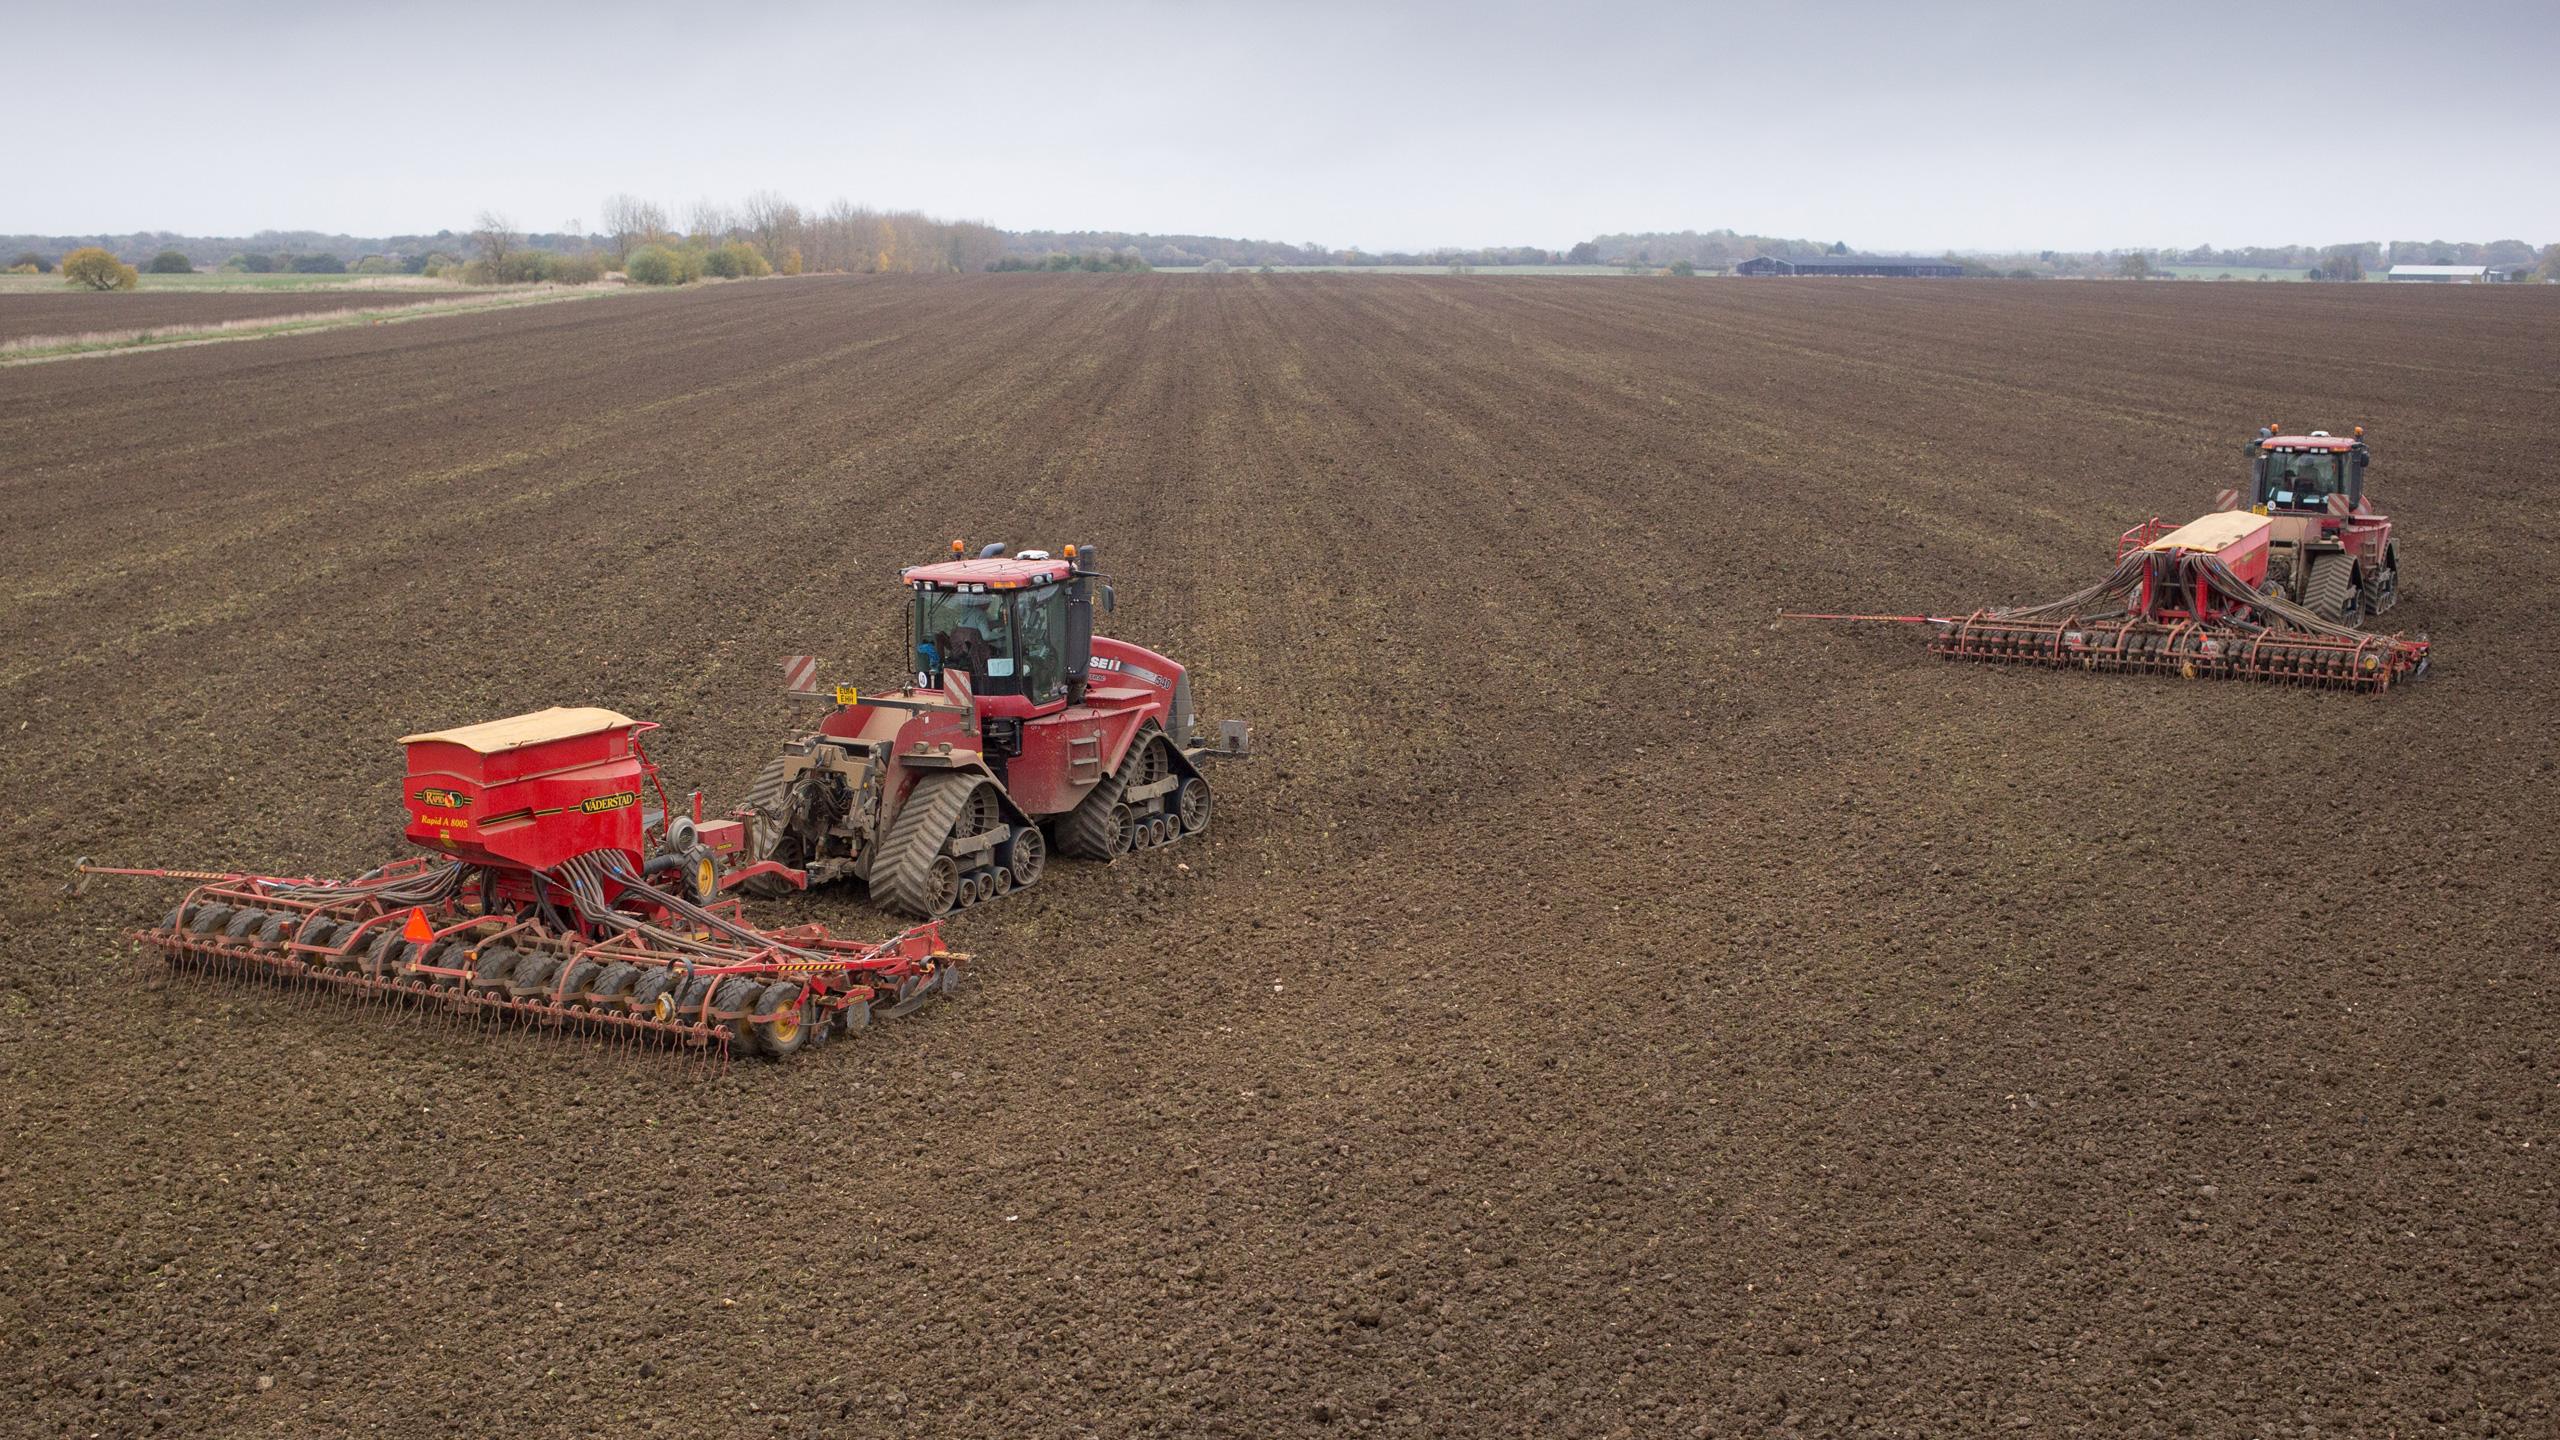 Case Quadtrac 540's - Drilling Winter Crops - Desborough Airfield